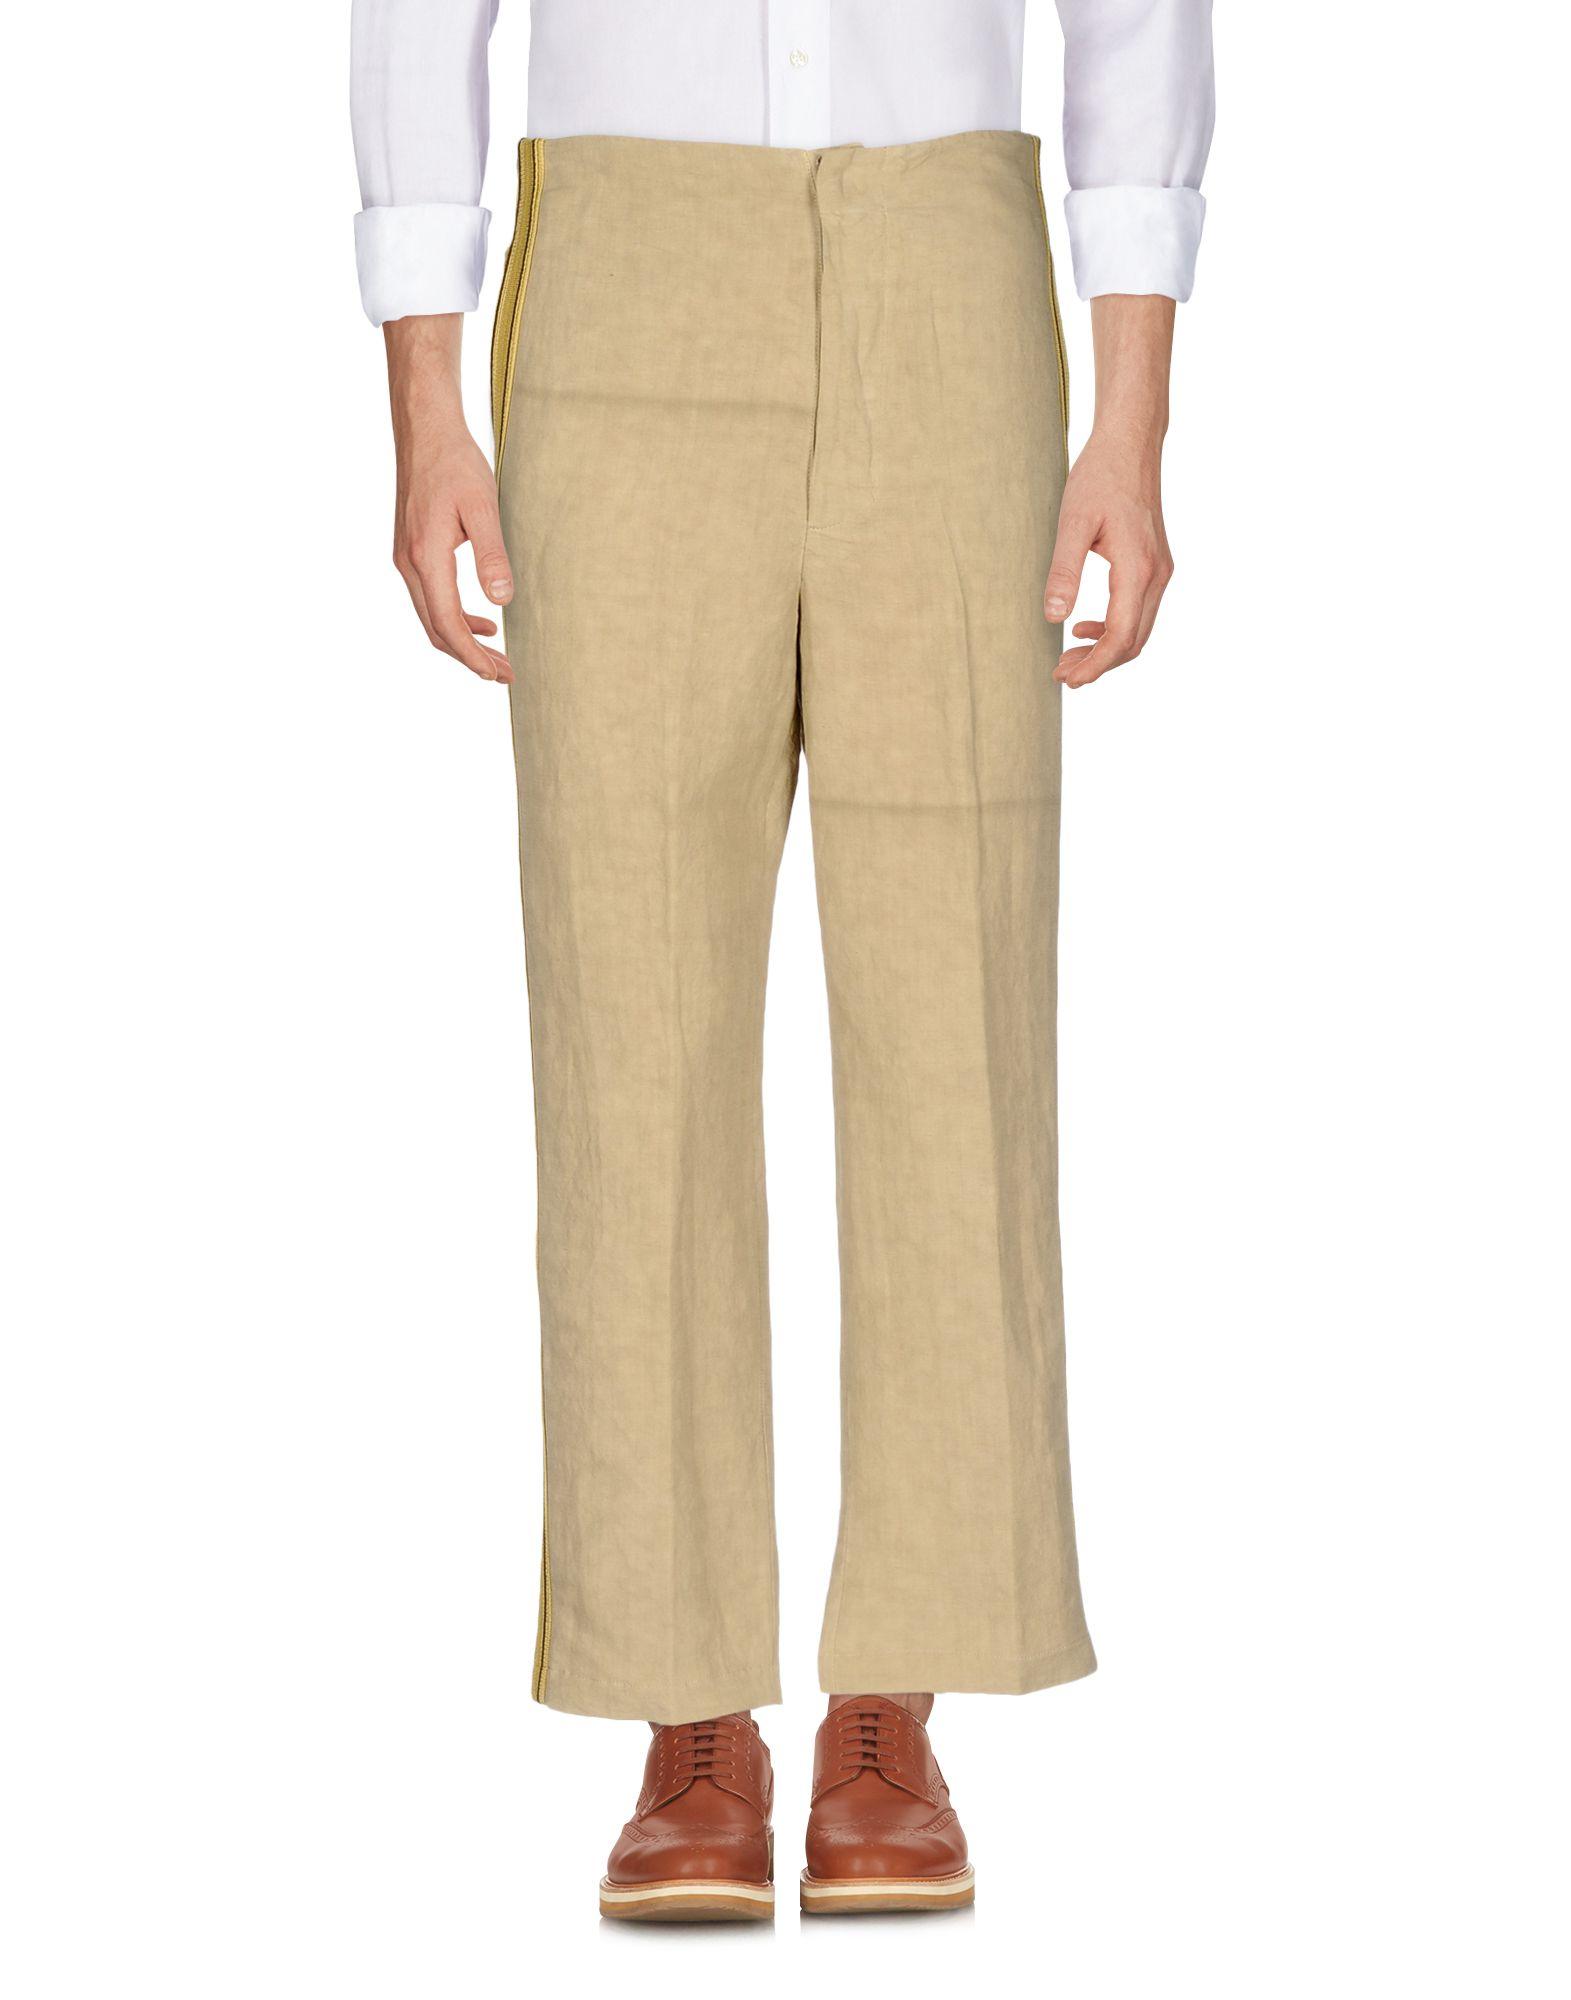 Pantalone Nuur Uomo - Acquista online su